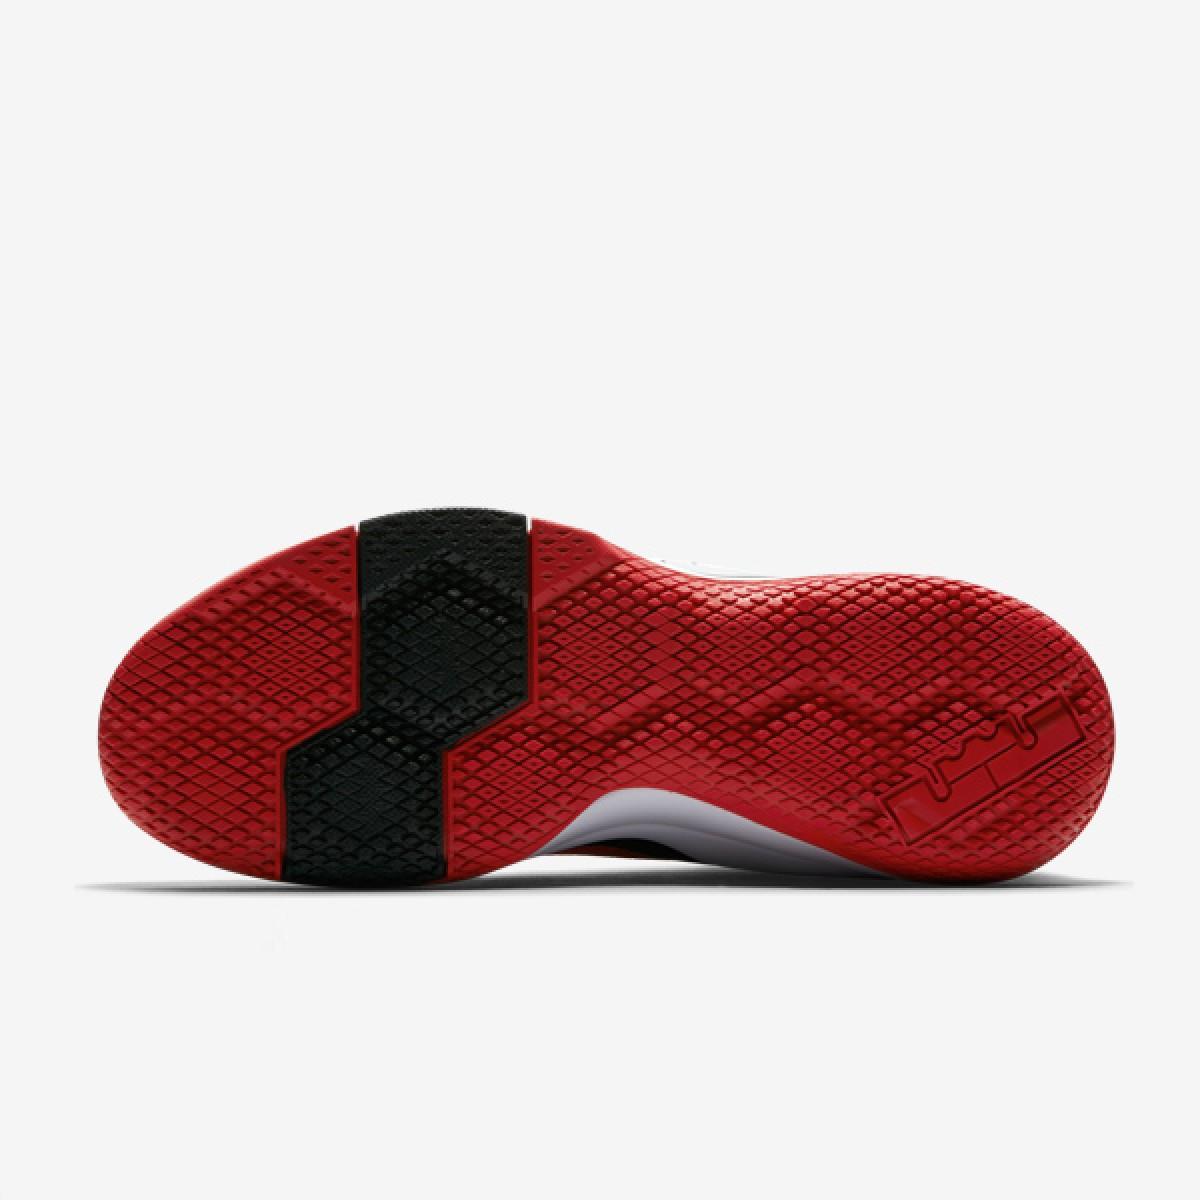 Nike Lebron Witness II 'Bred' 942518-006